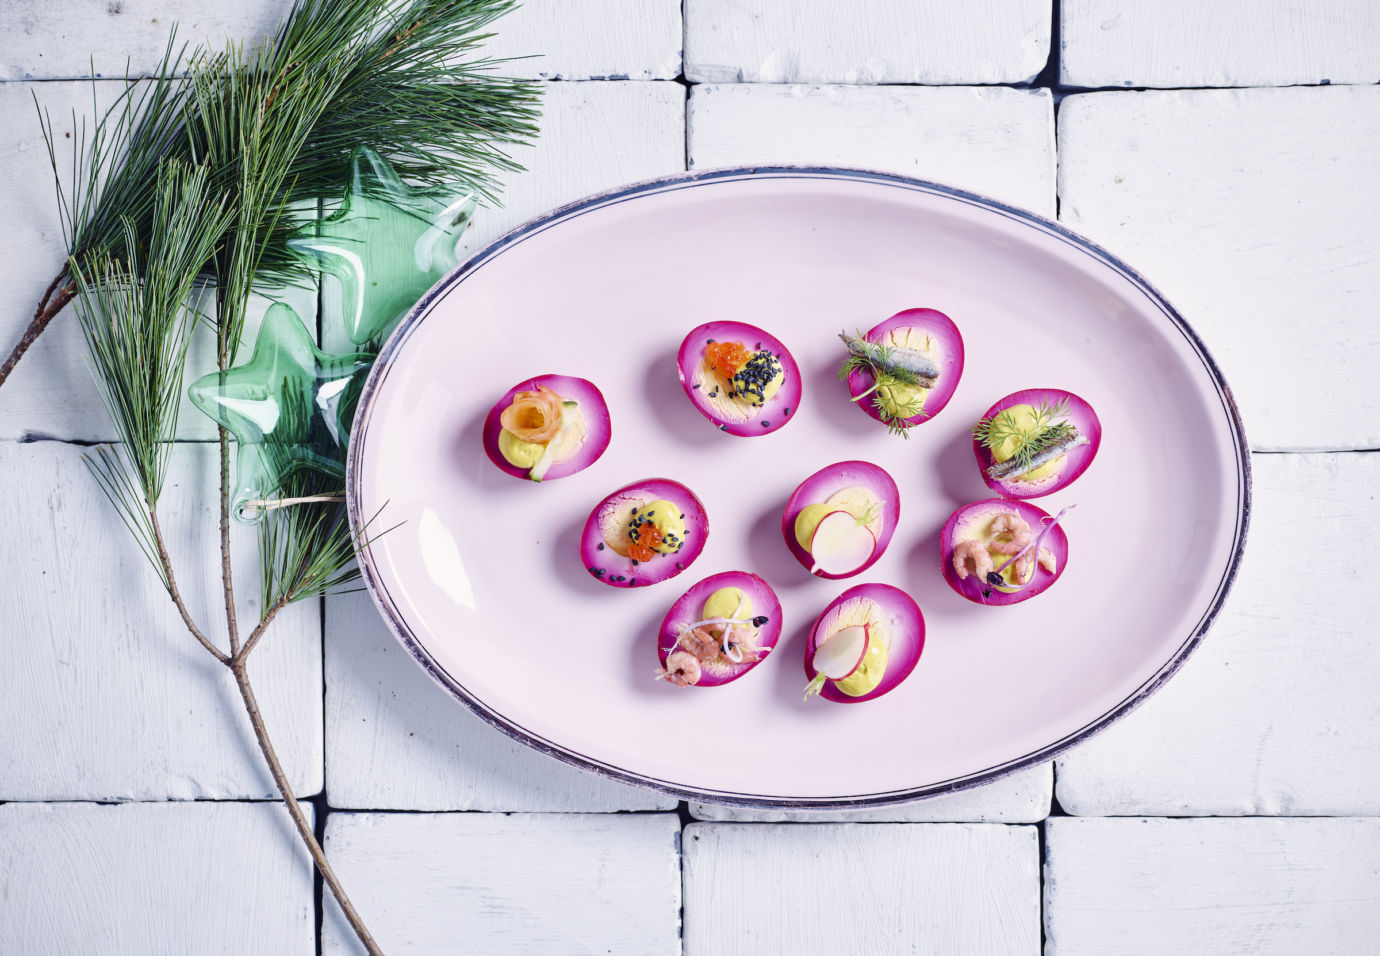 Pickled eggs met feest toppings door Sofie Dumont